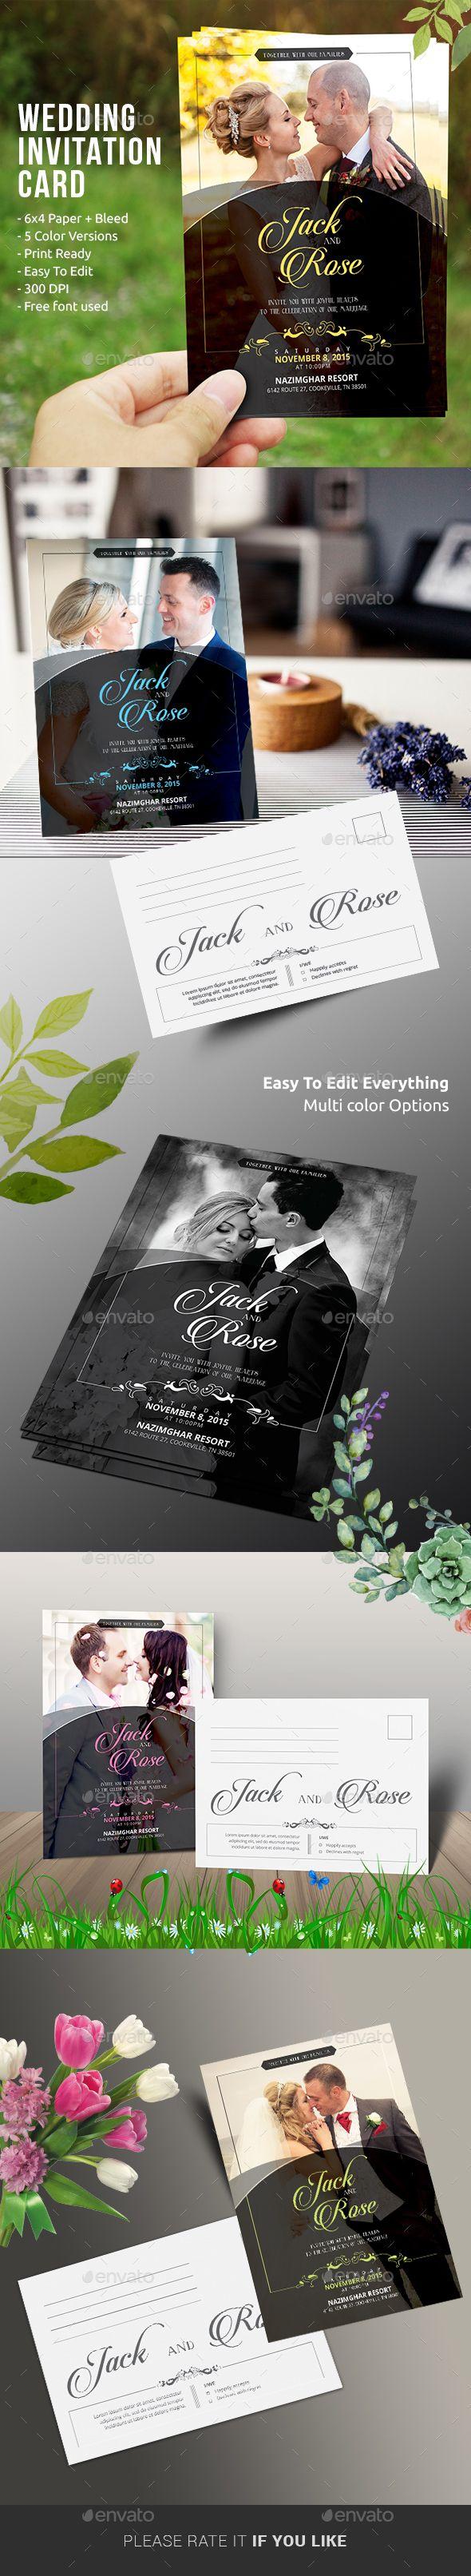 Wedding Invitation Design - Weddings Cards & Invitation Template Instant Download http://graphicriver.net/item/wedding-invitation/13429653?ref=themedevisers